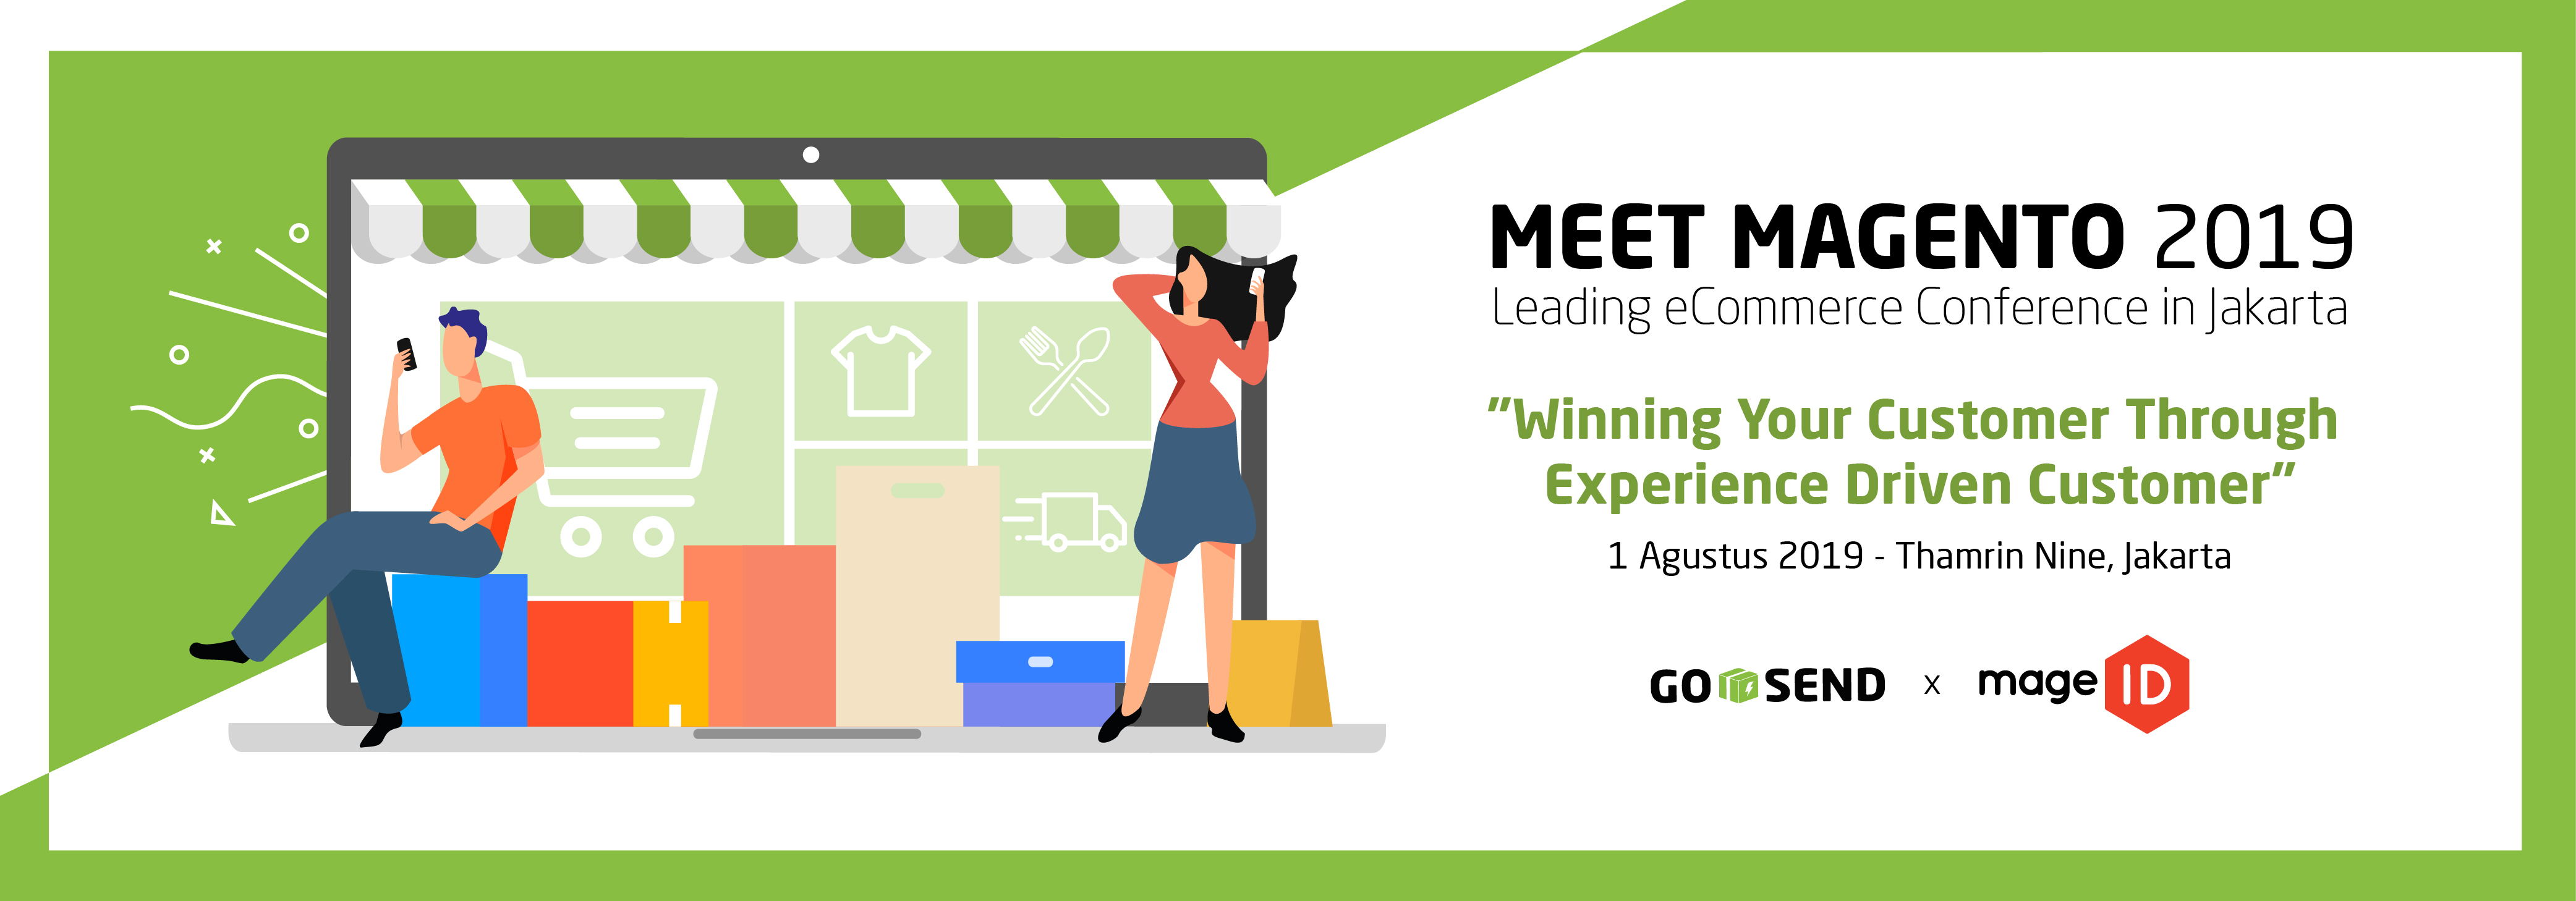 Konferensi Wajib Para Penggiat E-Commerce: Meet Magento Indonesia #MM19ID